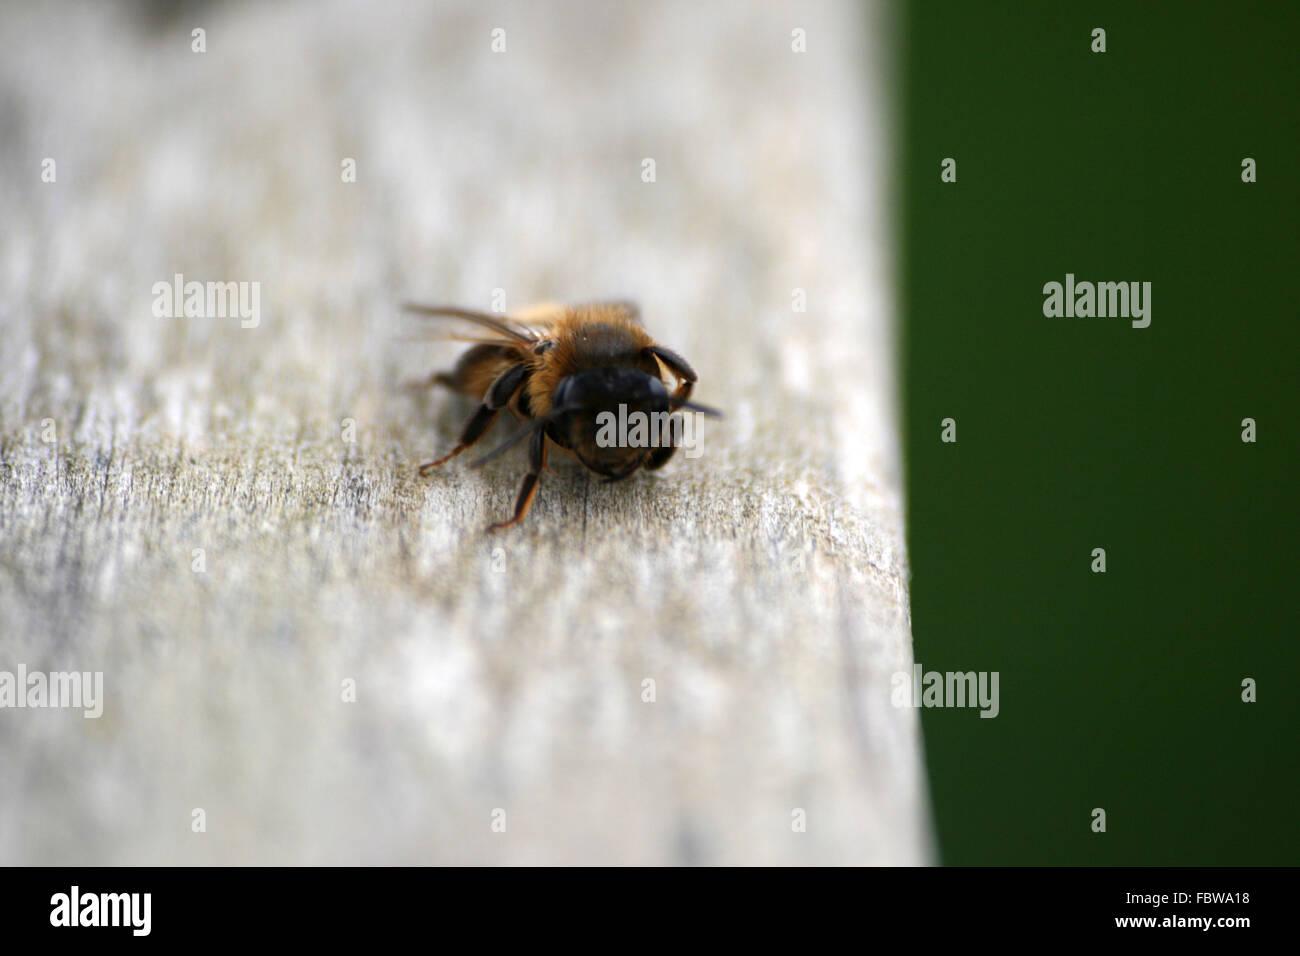 Nahaufnahme einer müde Biene, Cornwall, England Stockbild